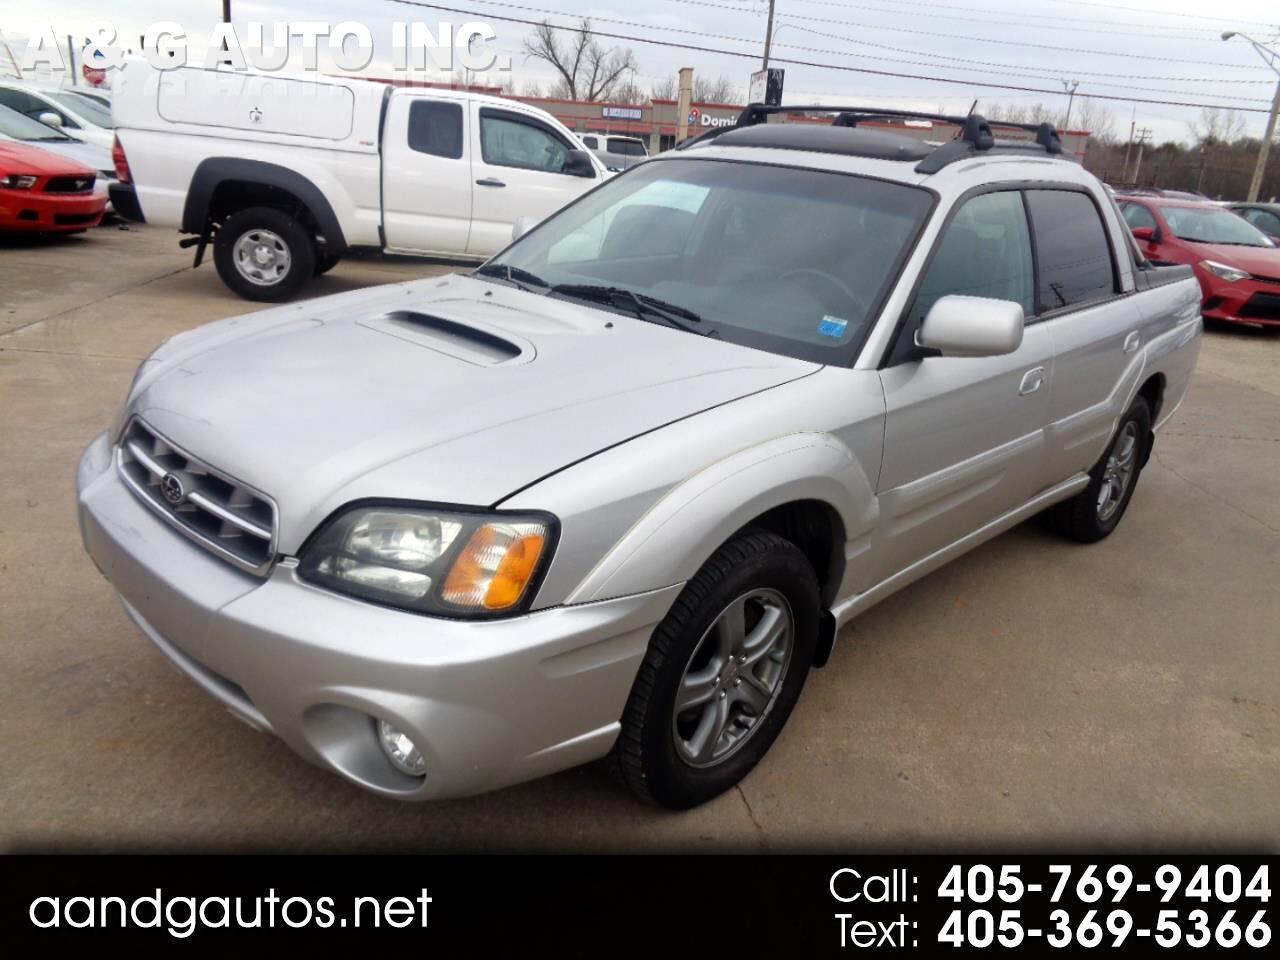 Subaru Baja Turbo 2004